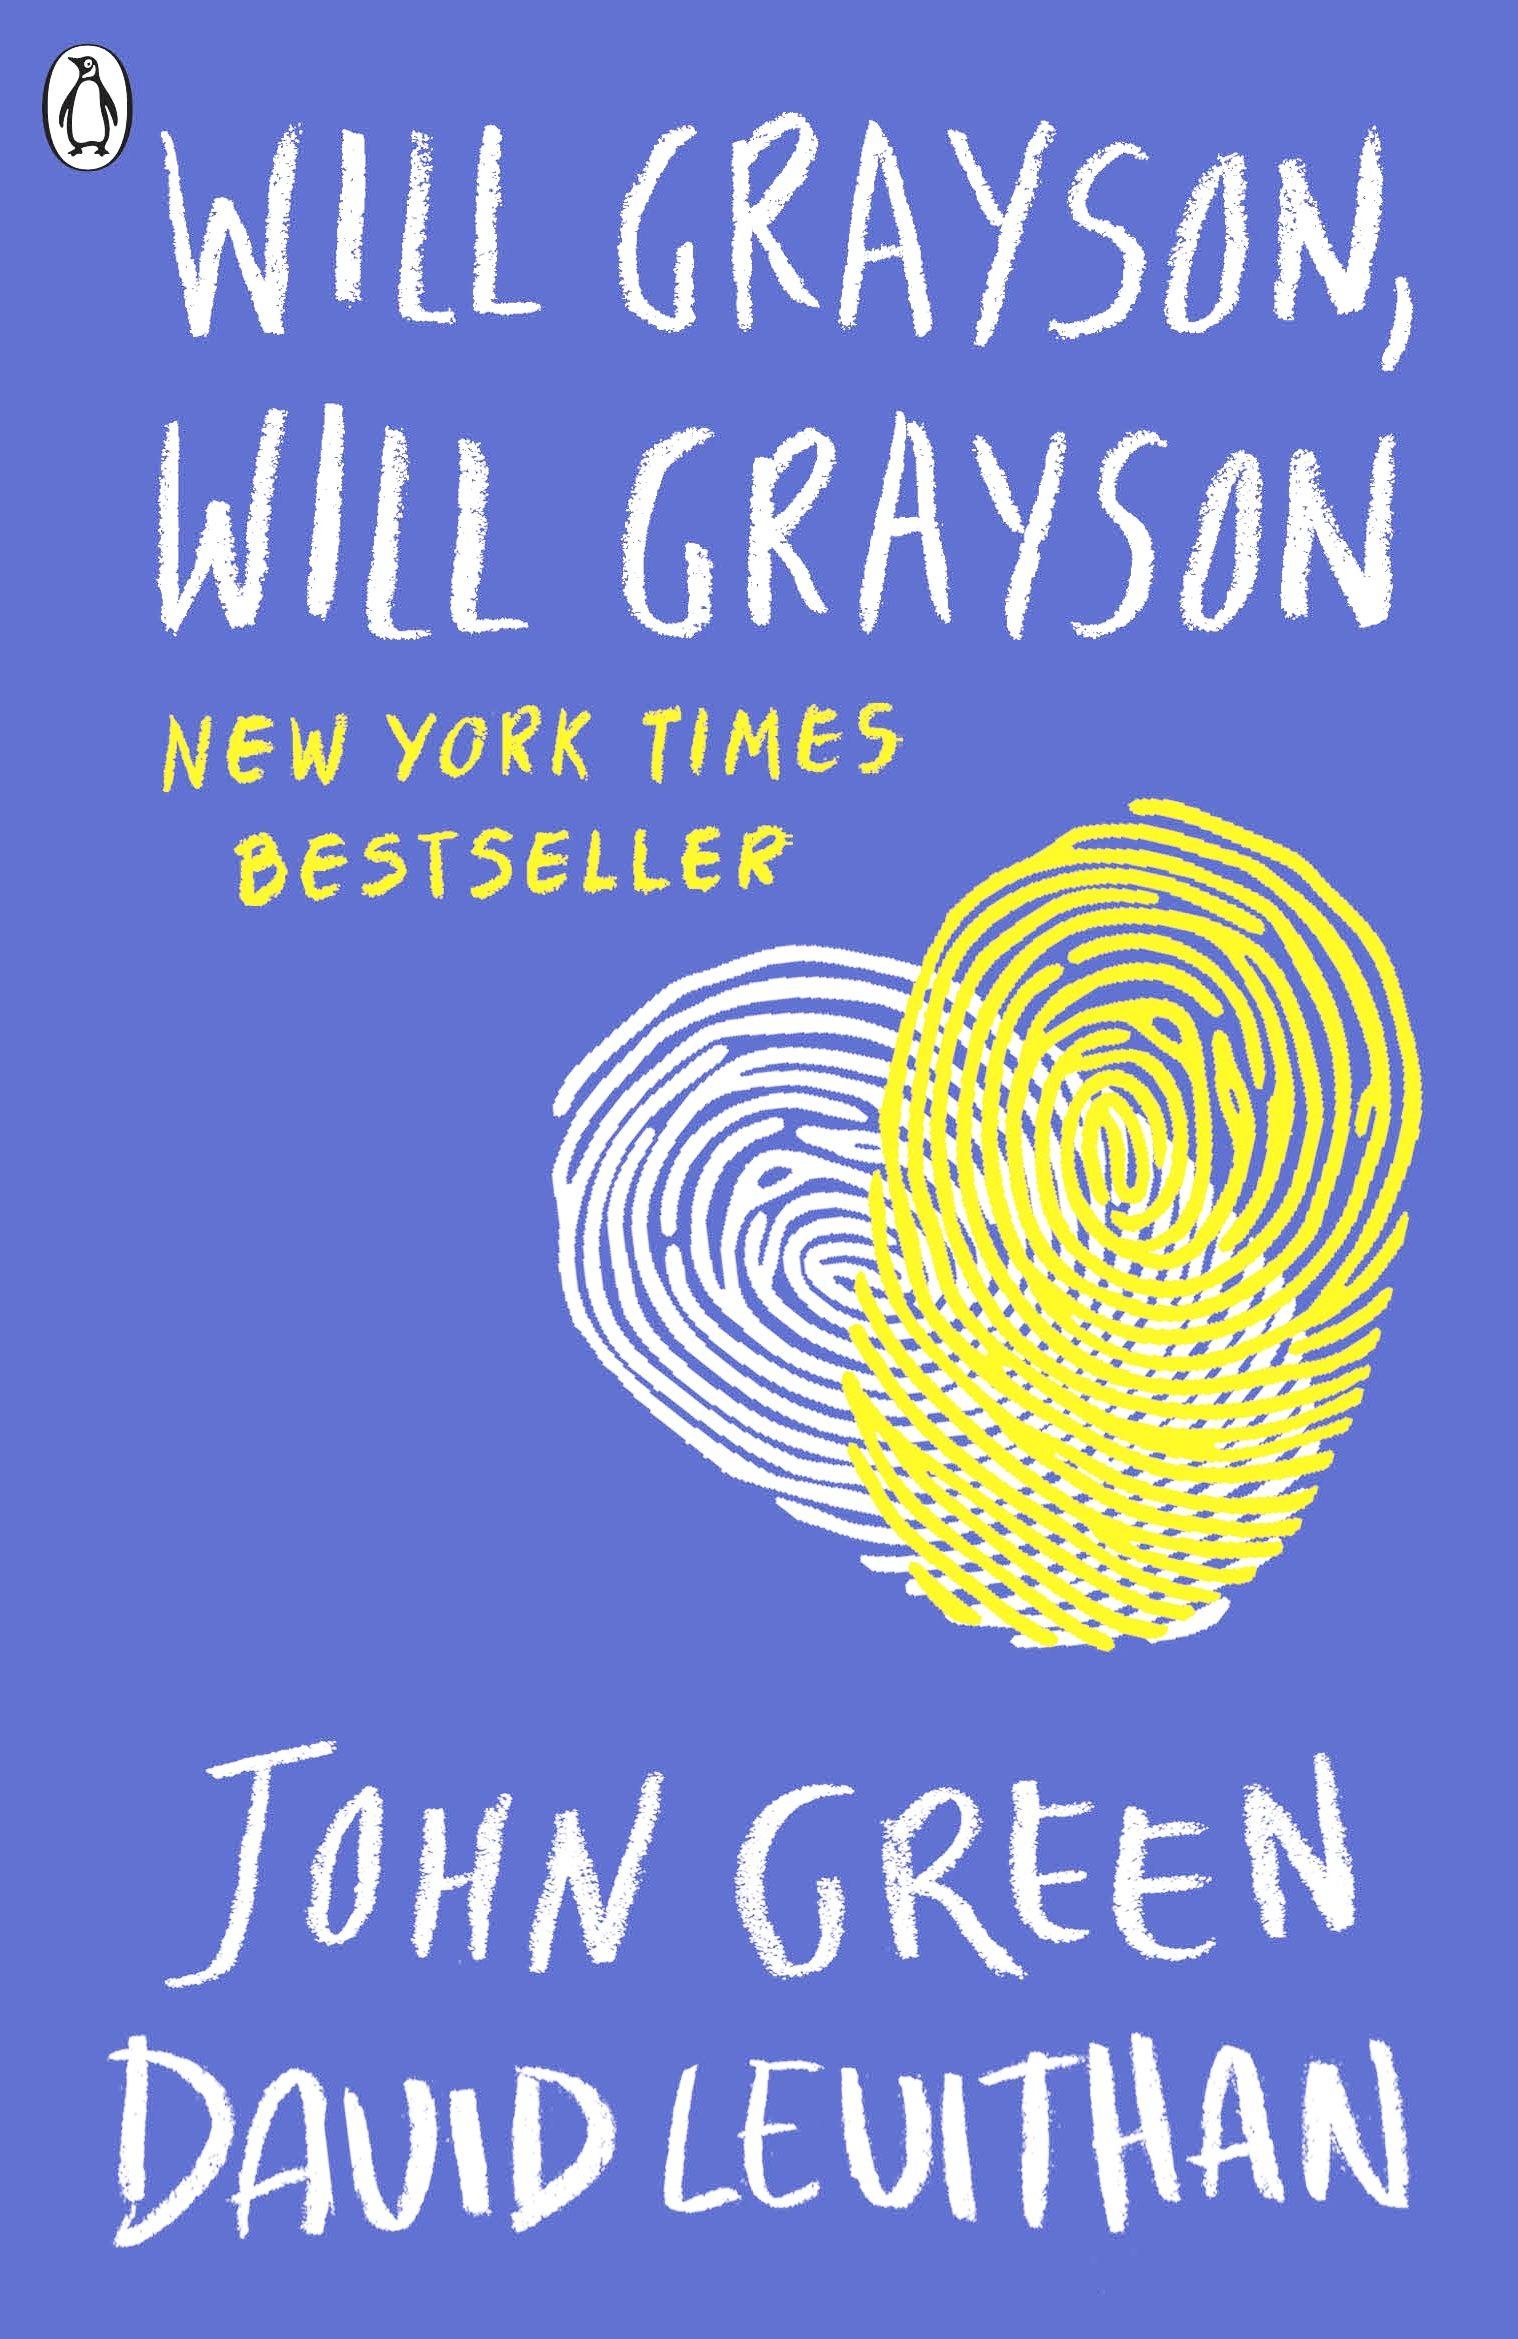 Will Grayson, Will Grayson (ebook)john Green9780141346120